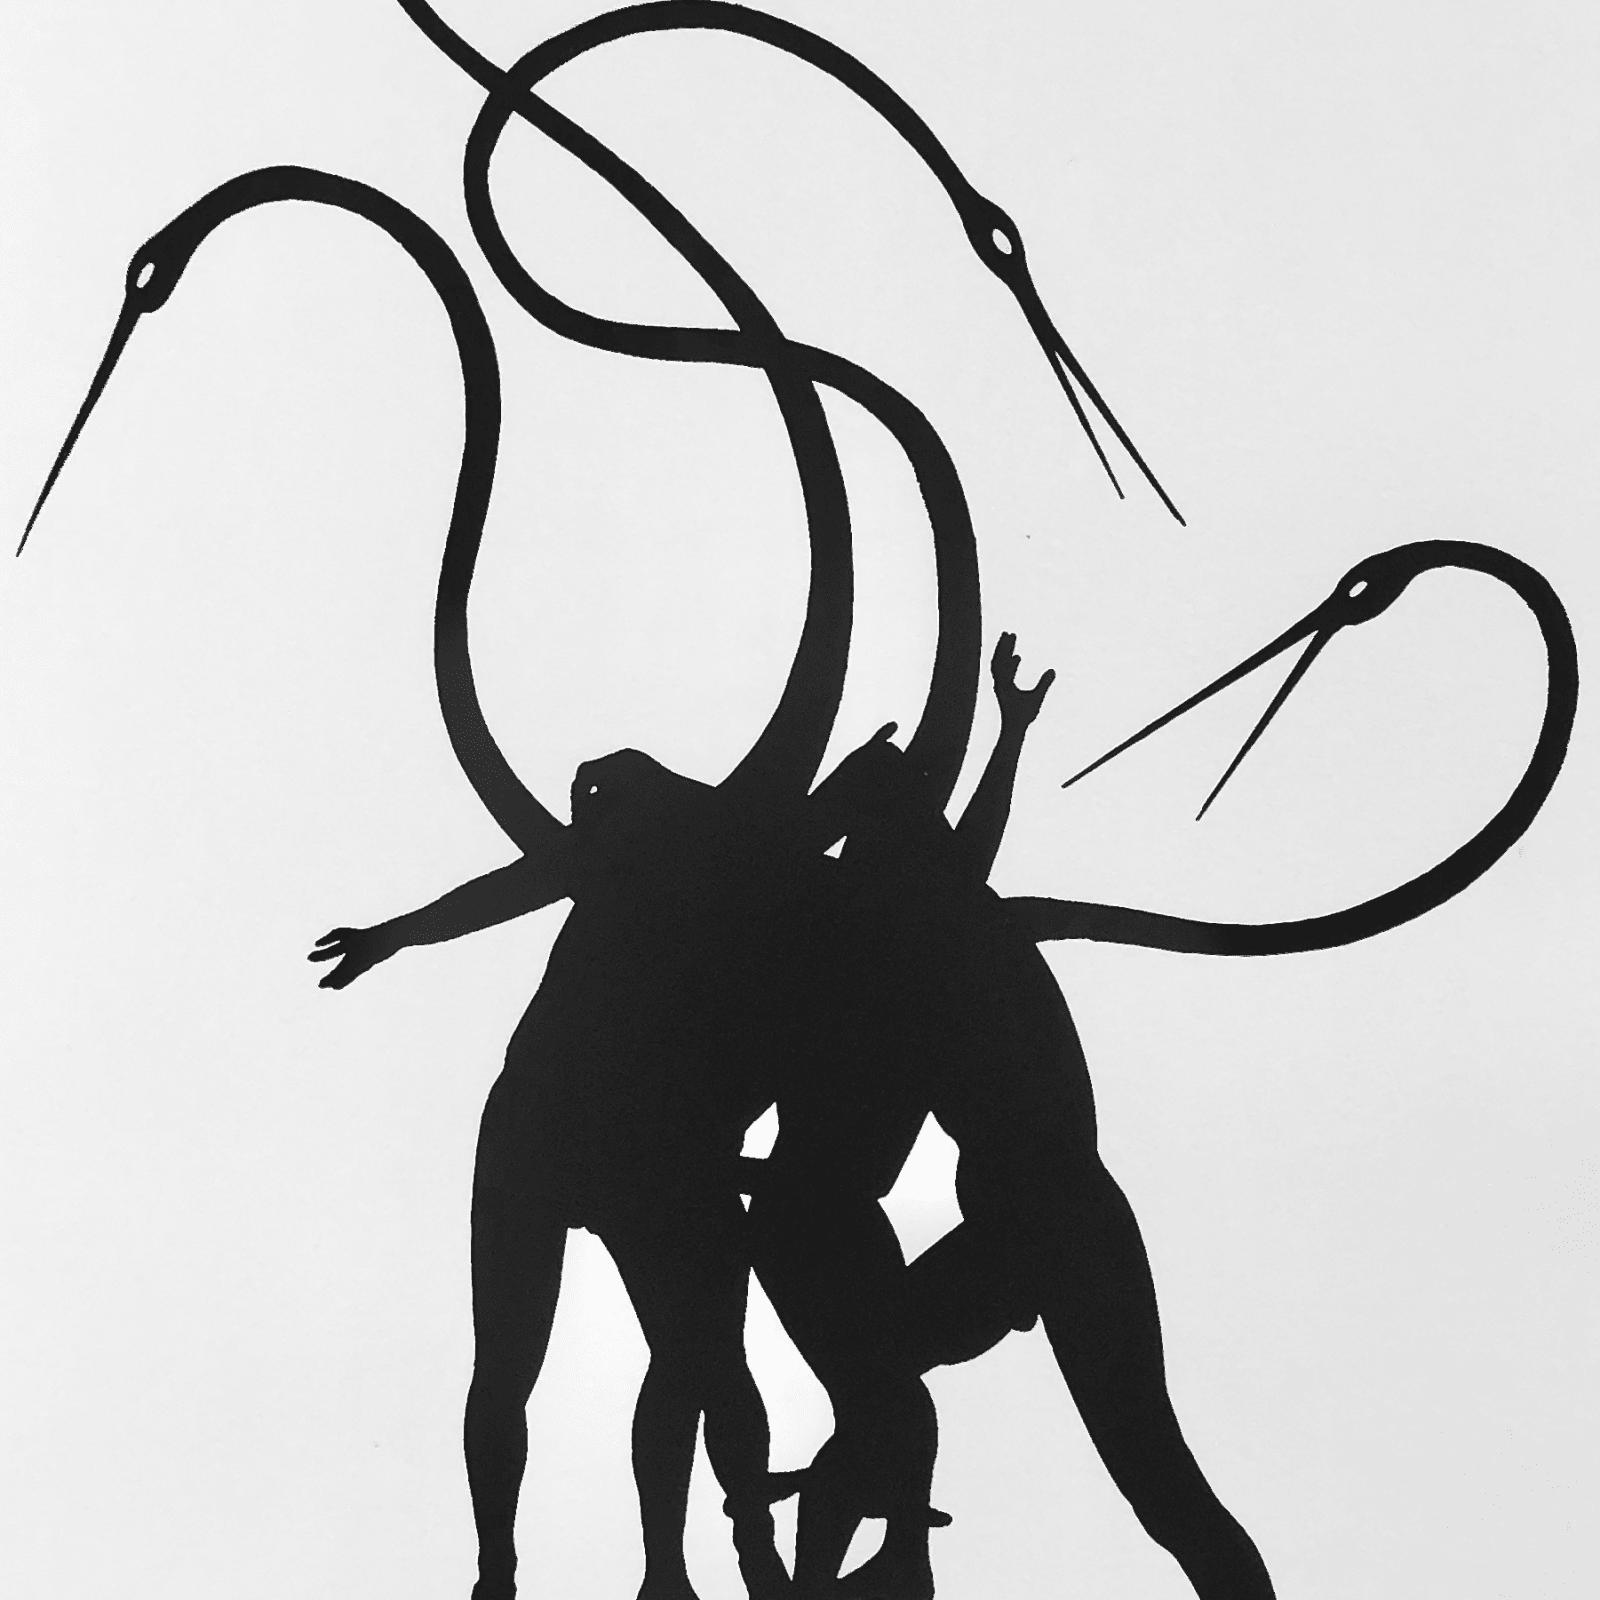 Peter Hristoff  Black Cranes, 2017  Monoprint  16 1/4 x 12 1/4 in (41.3 x 31.1 cm)